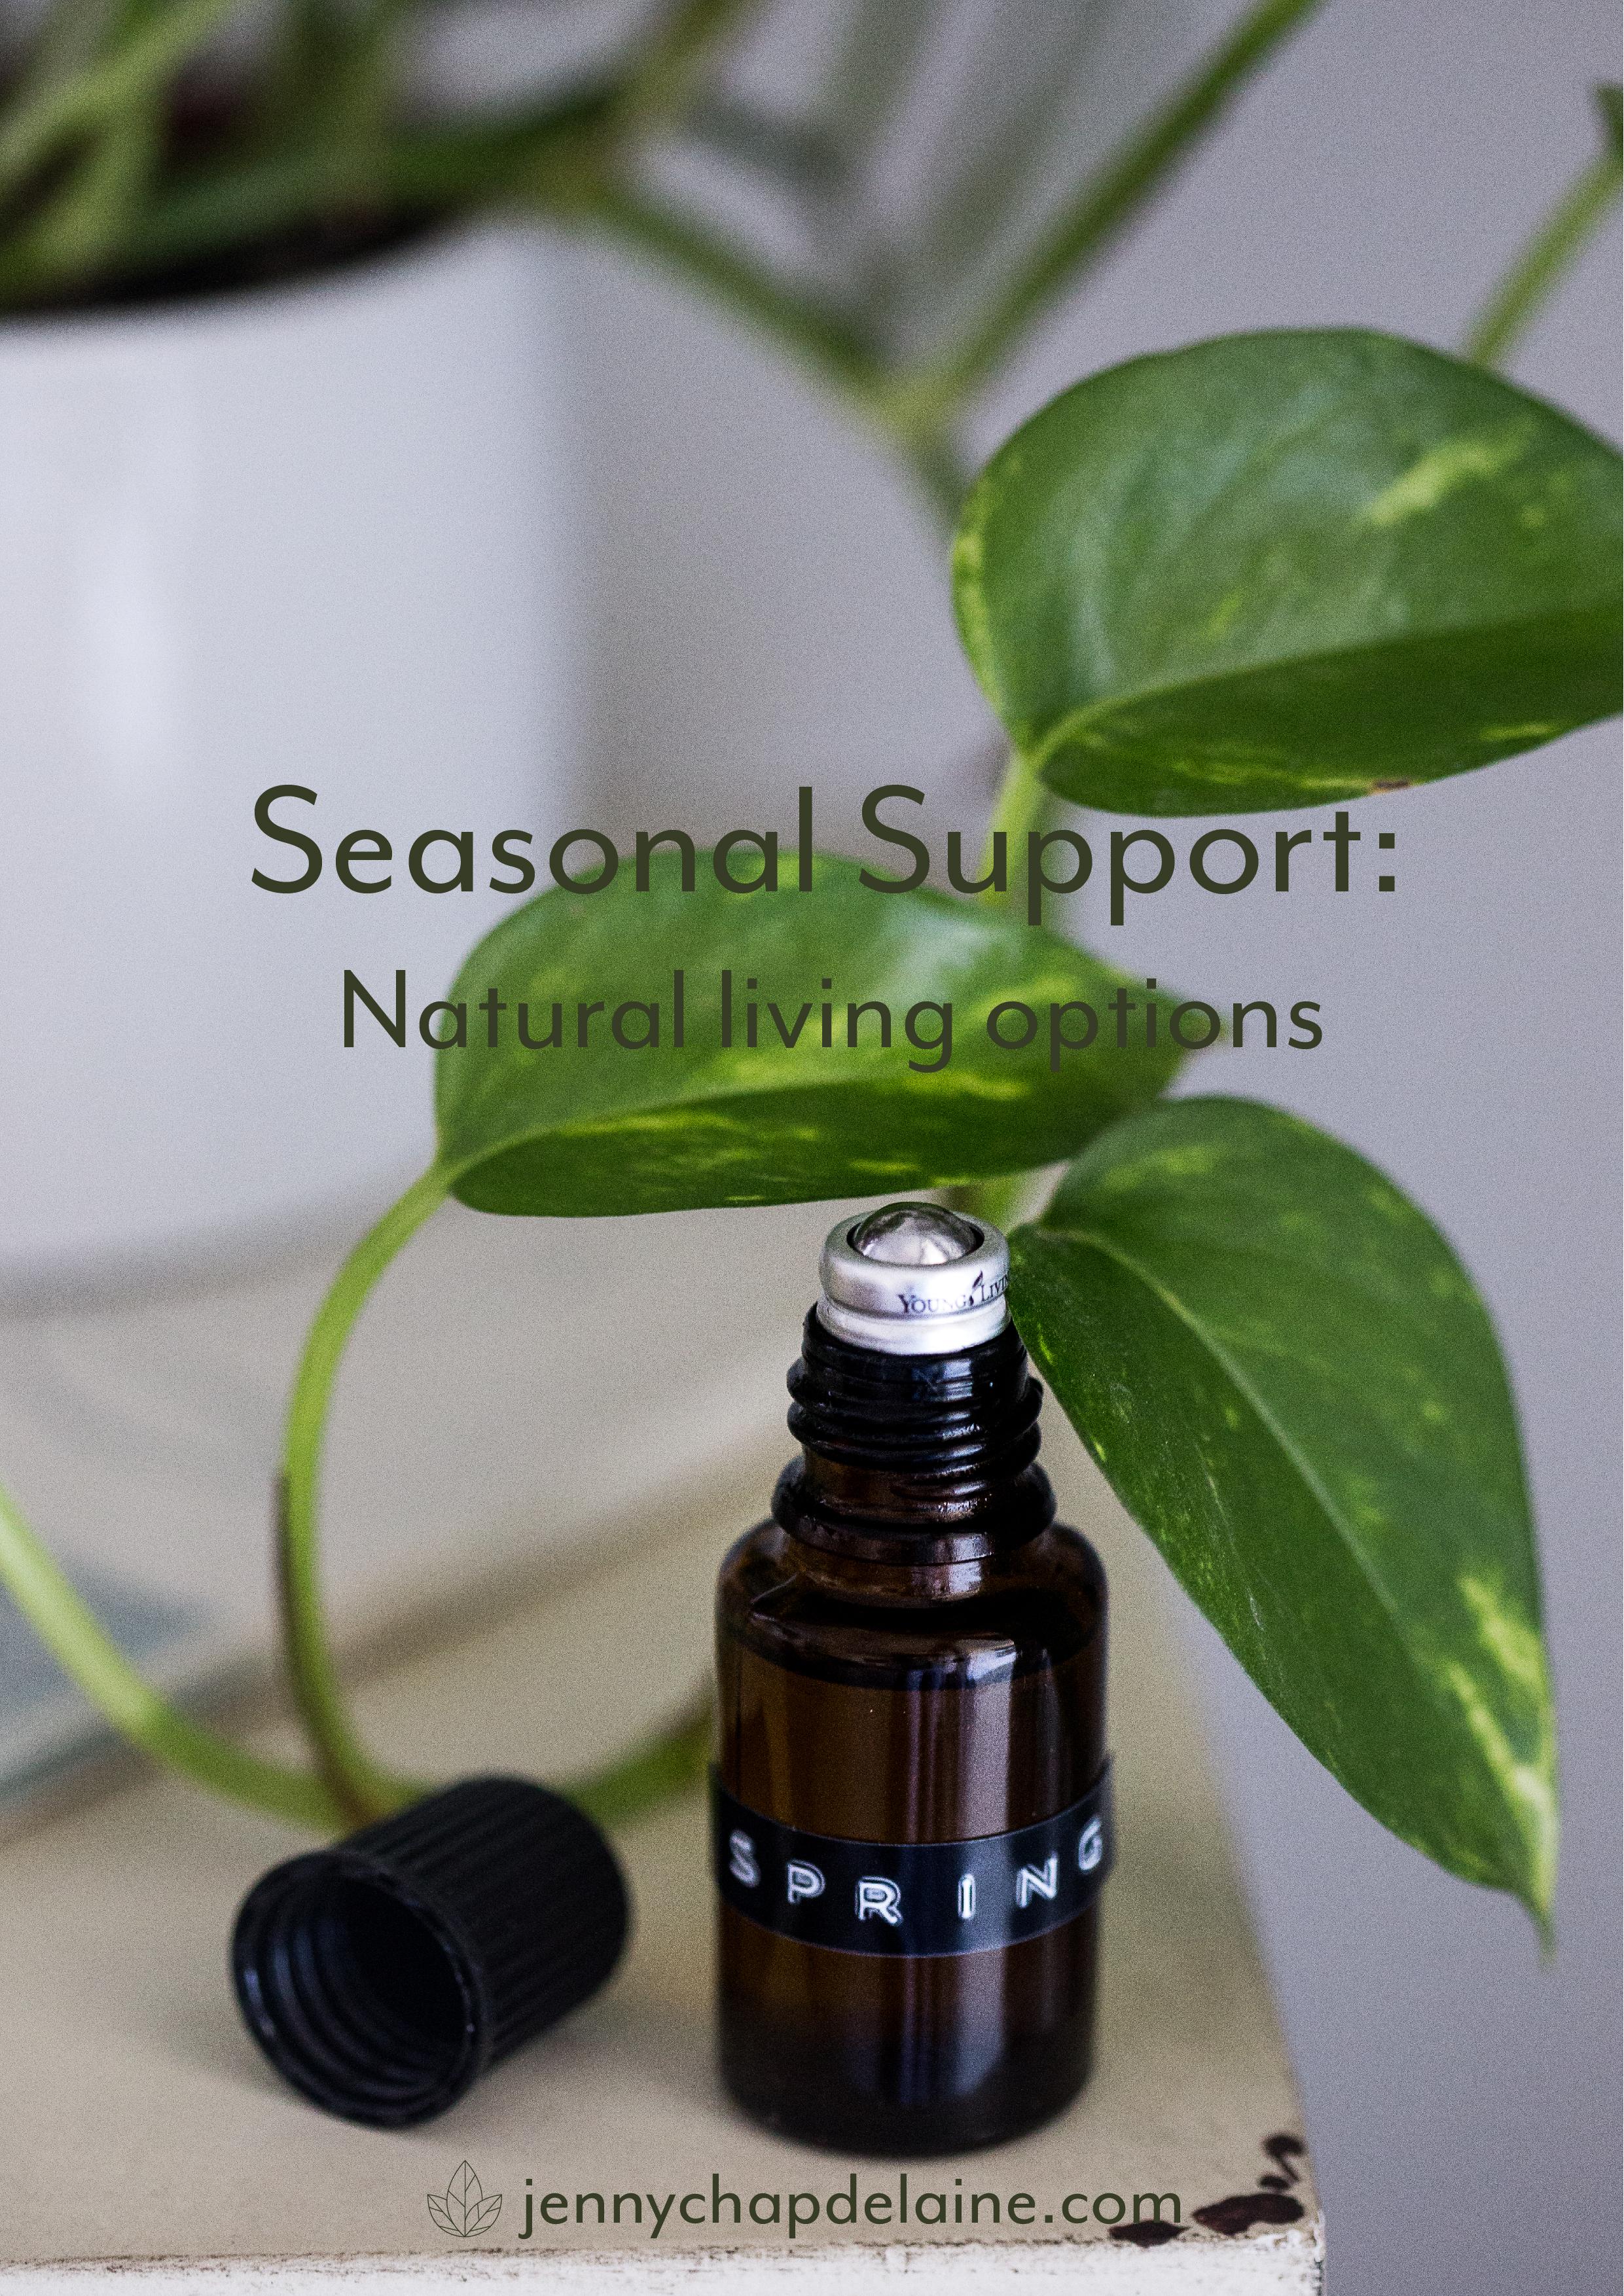 SeasonalSupport.jpg